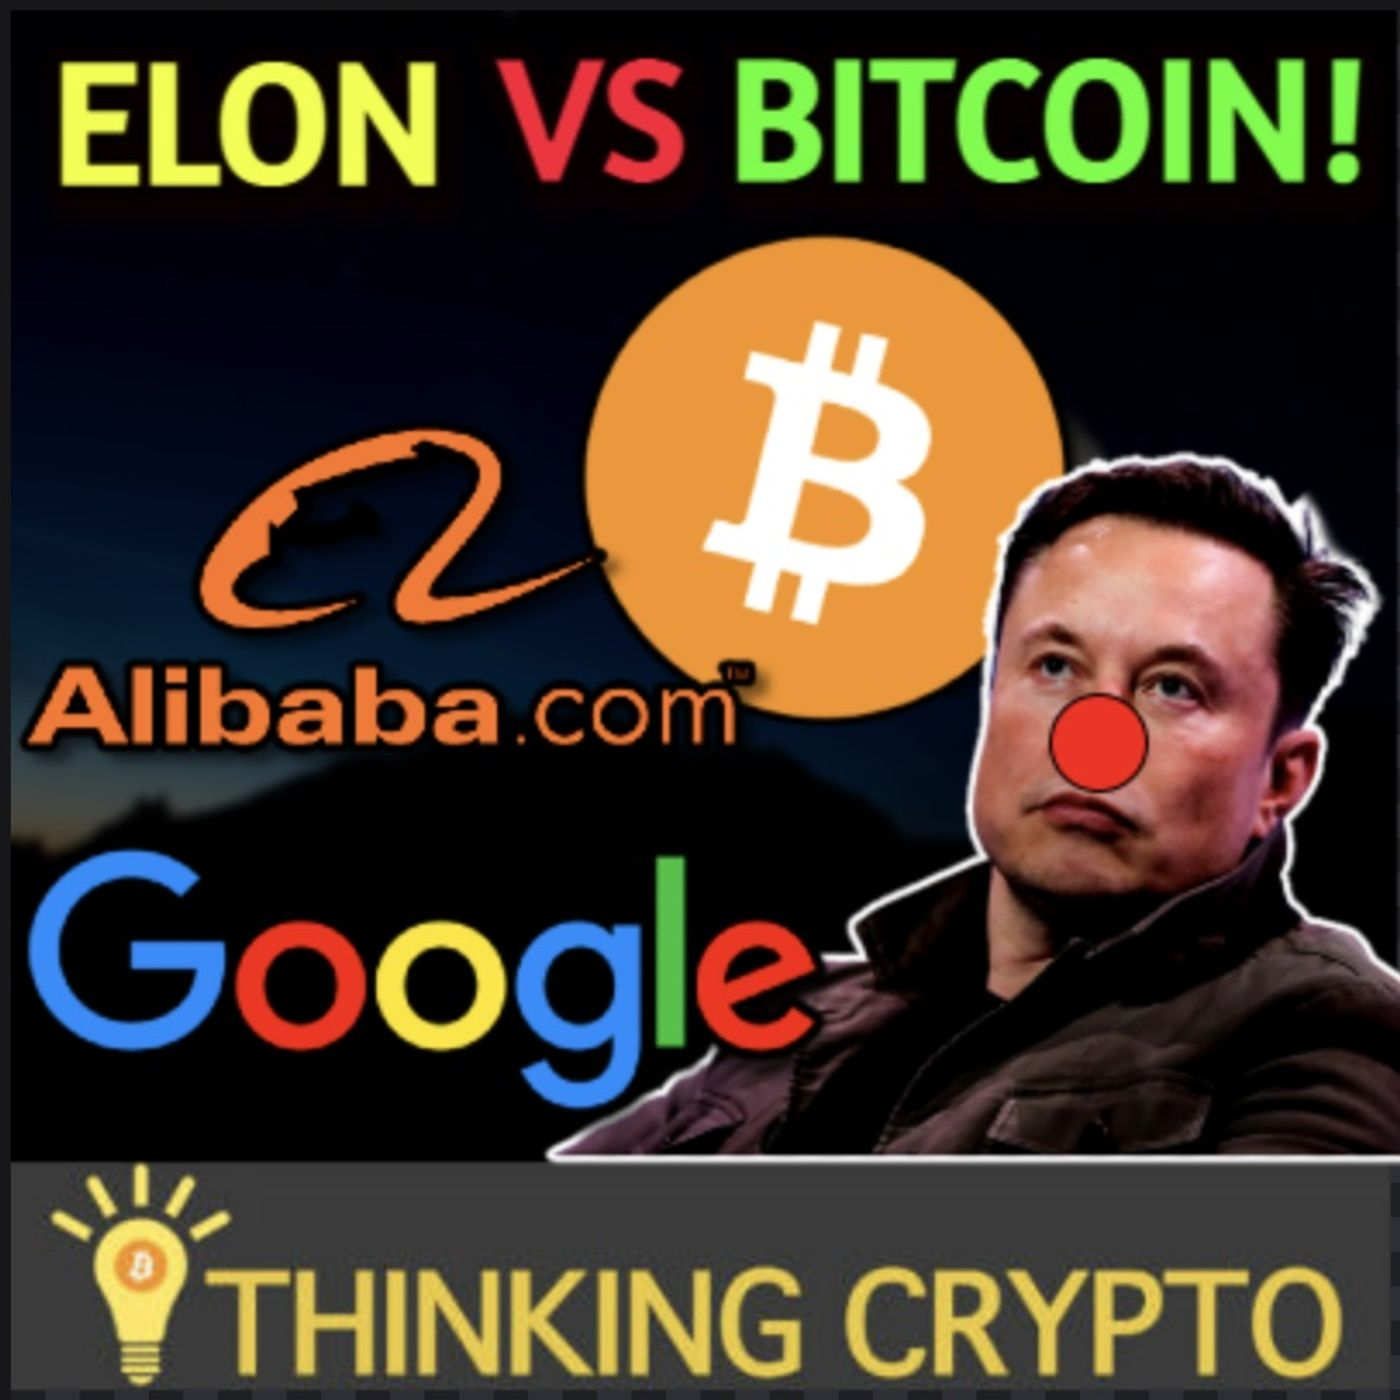 Elon Musk Manipulating Bitcoin - Alibaba & Google Crypto Licenses - Jack Dorsey Square BTC Wallet